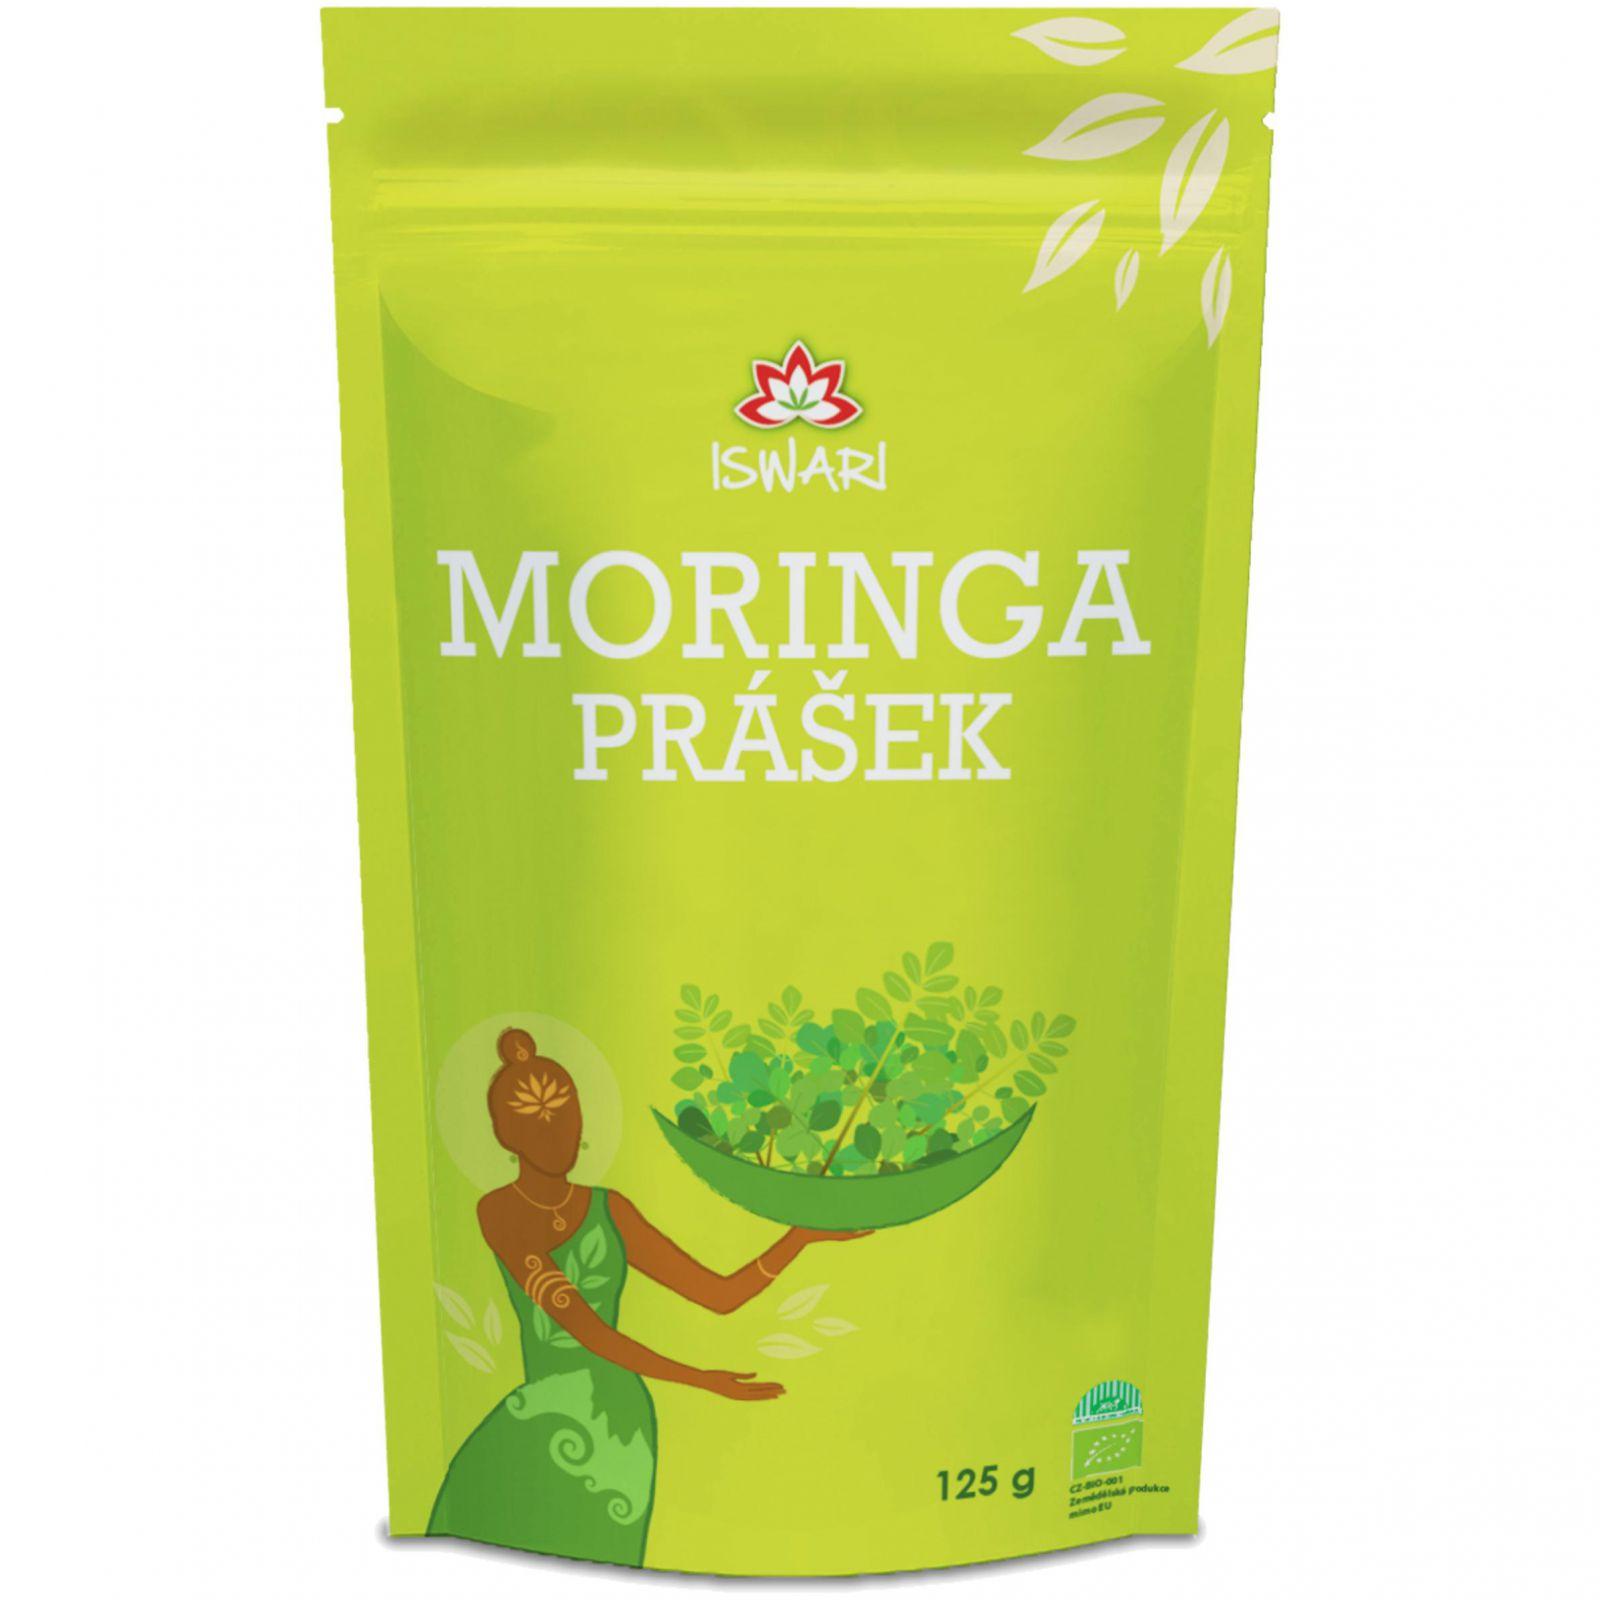 Iswari Moringa 125 g